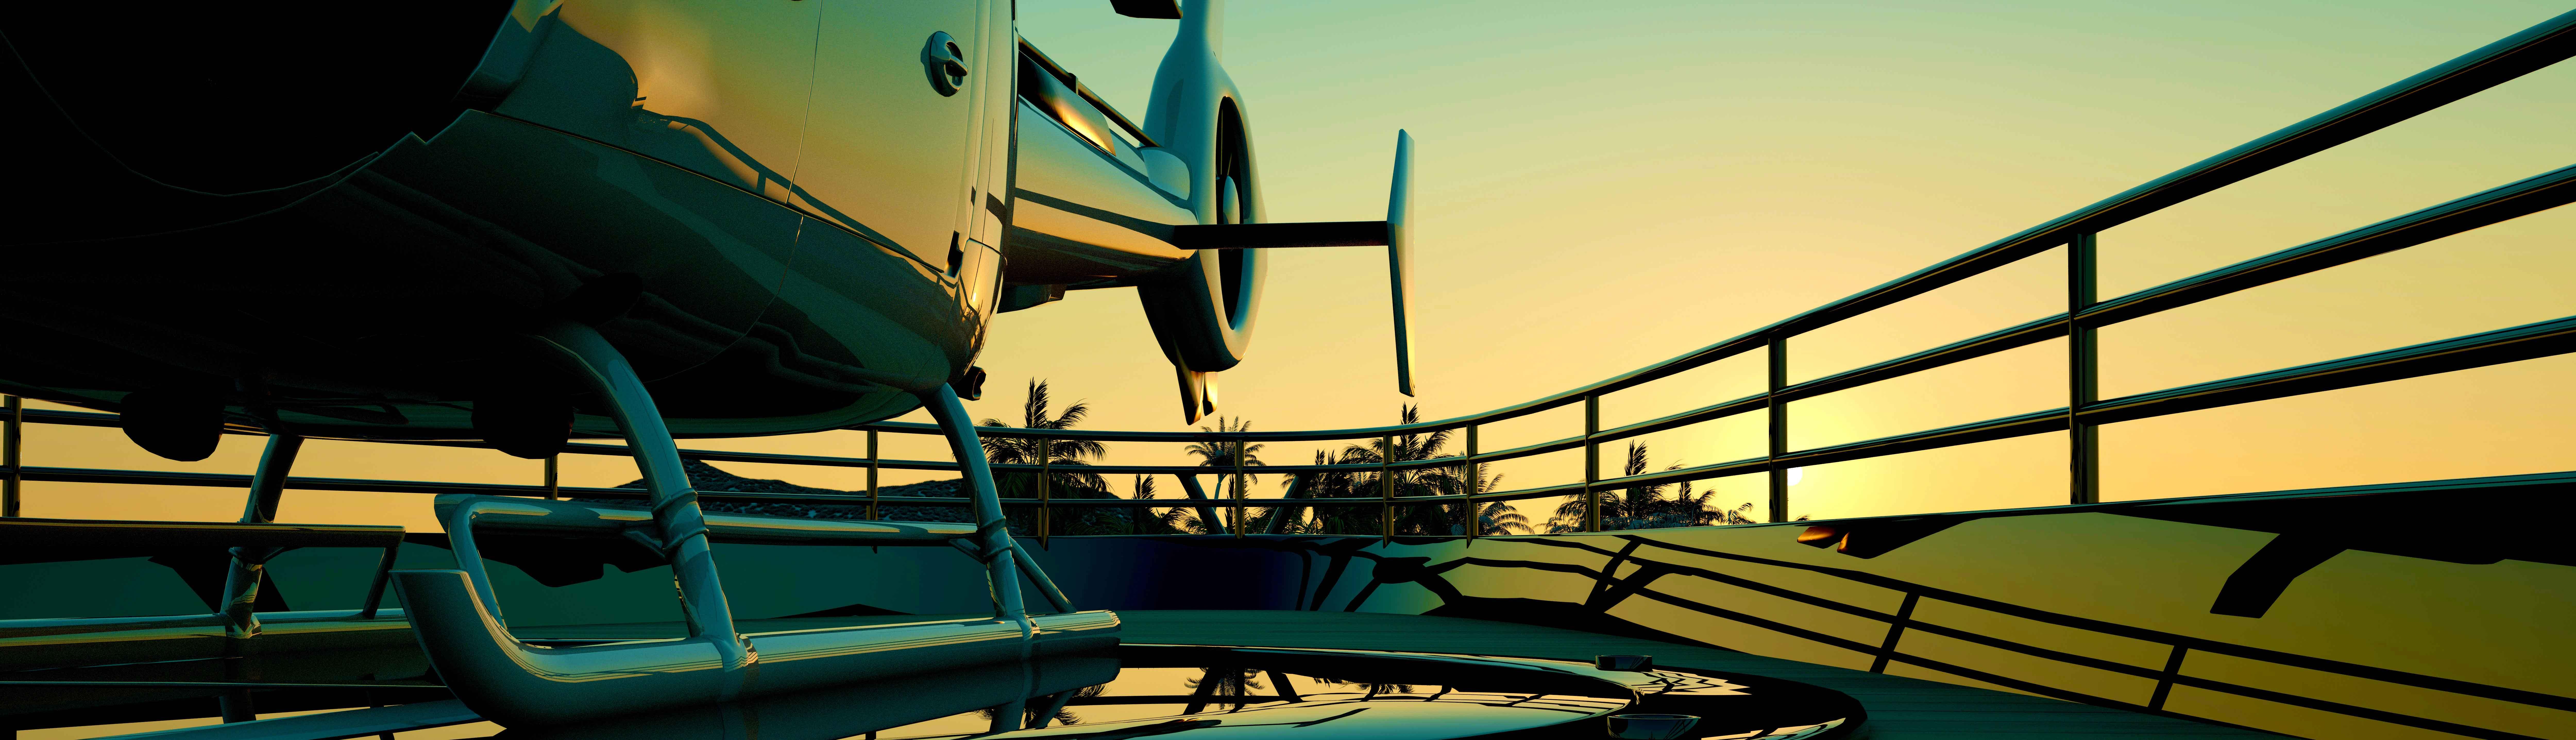 slrbooking-helikopter